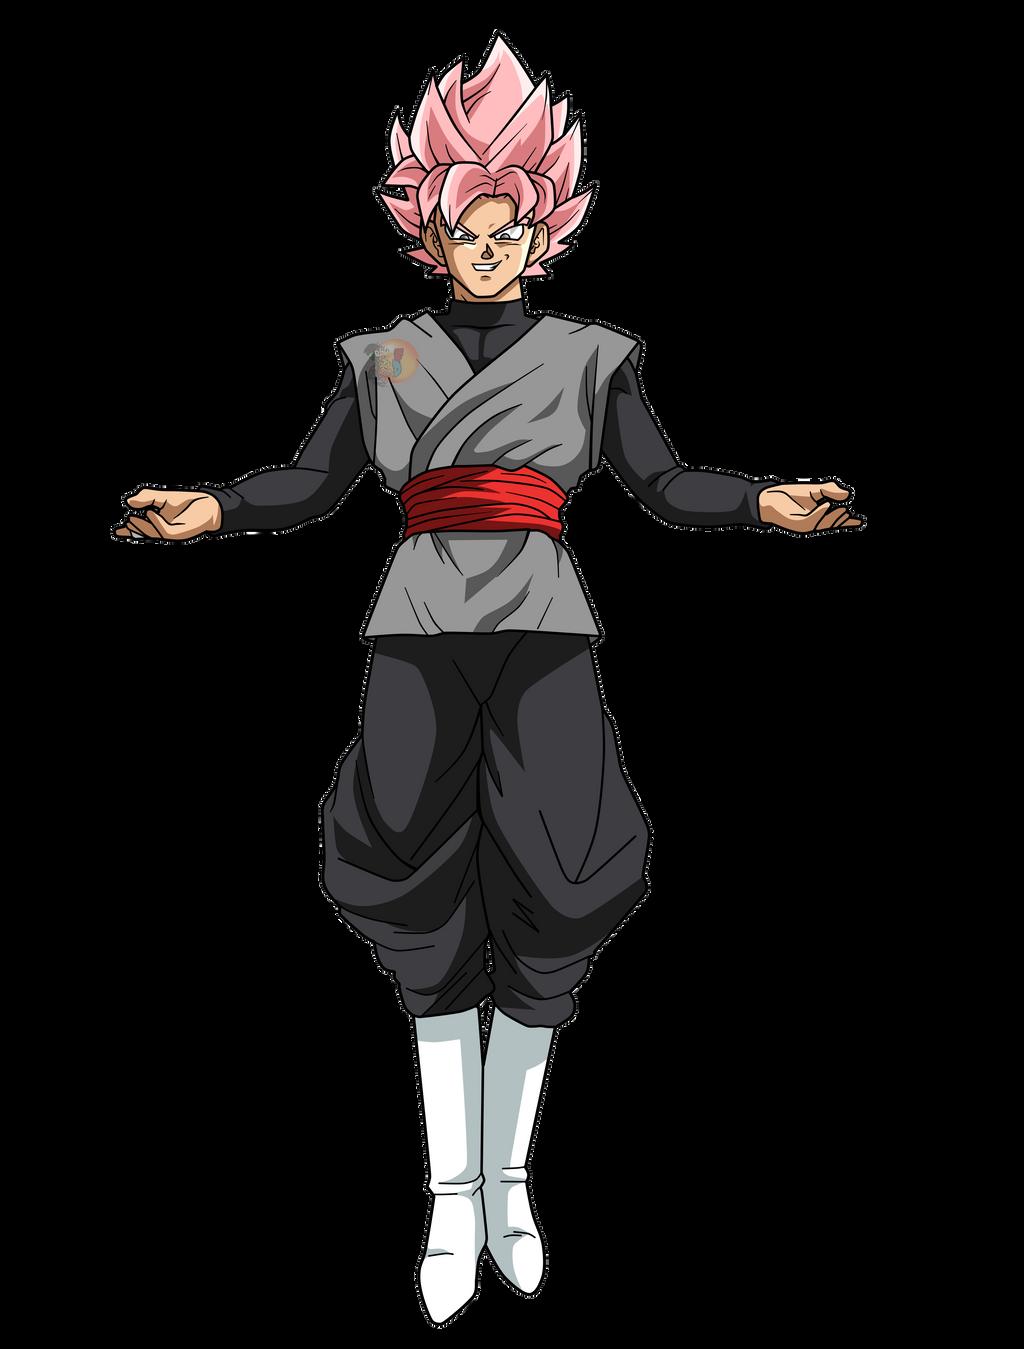 Image Result For Anime Wallpaper Blacka